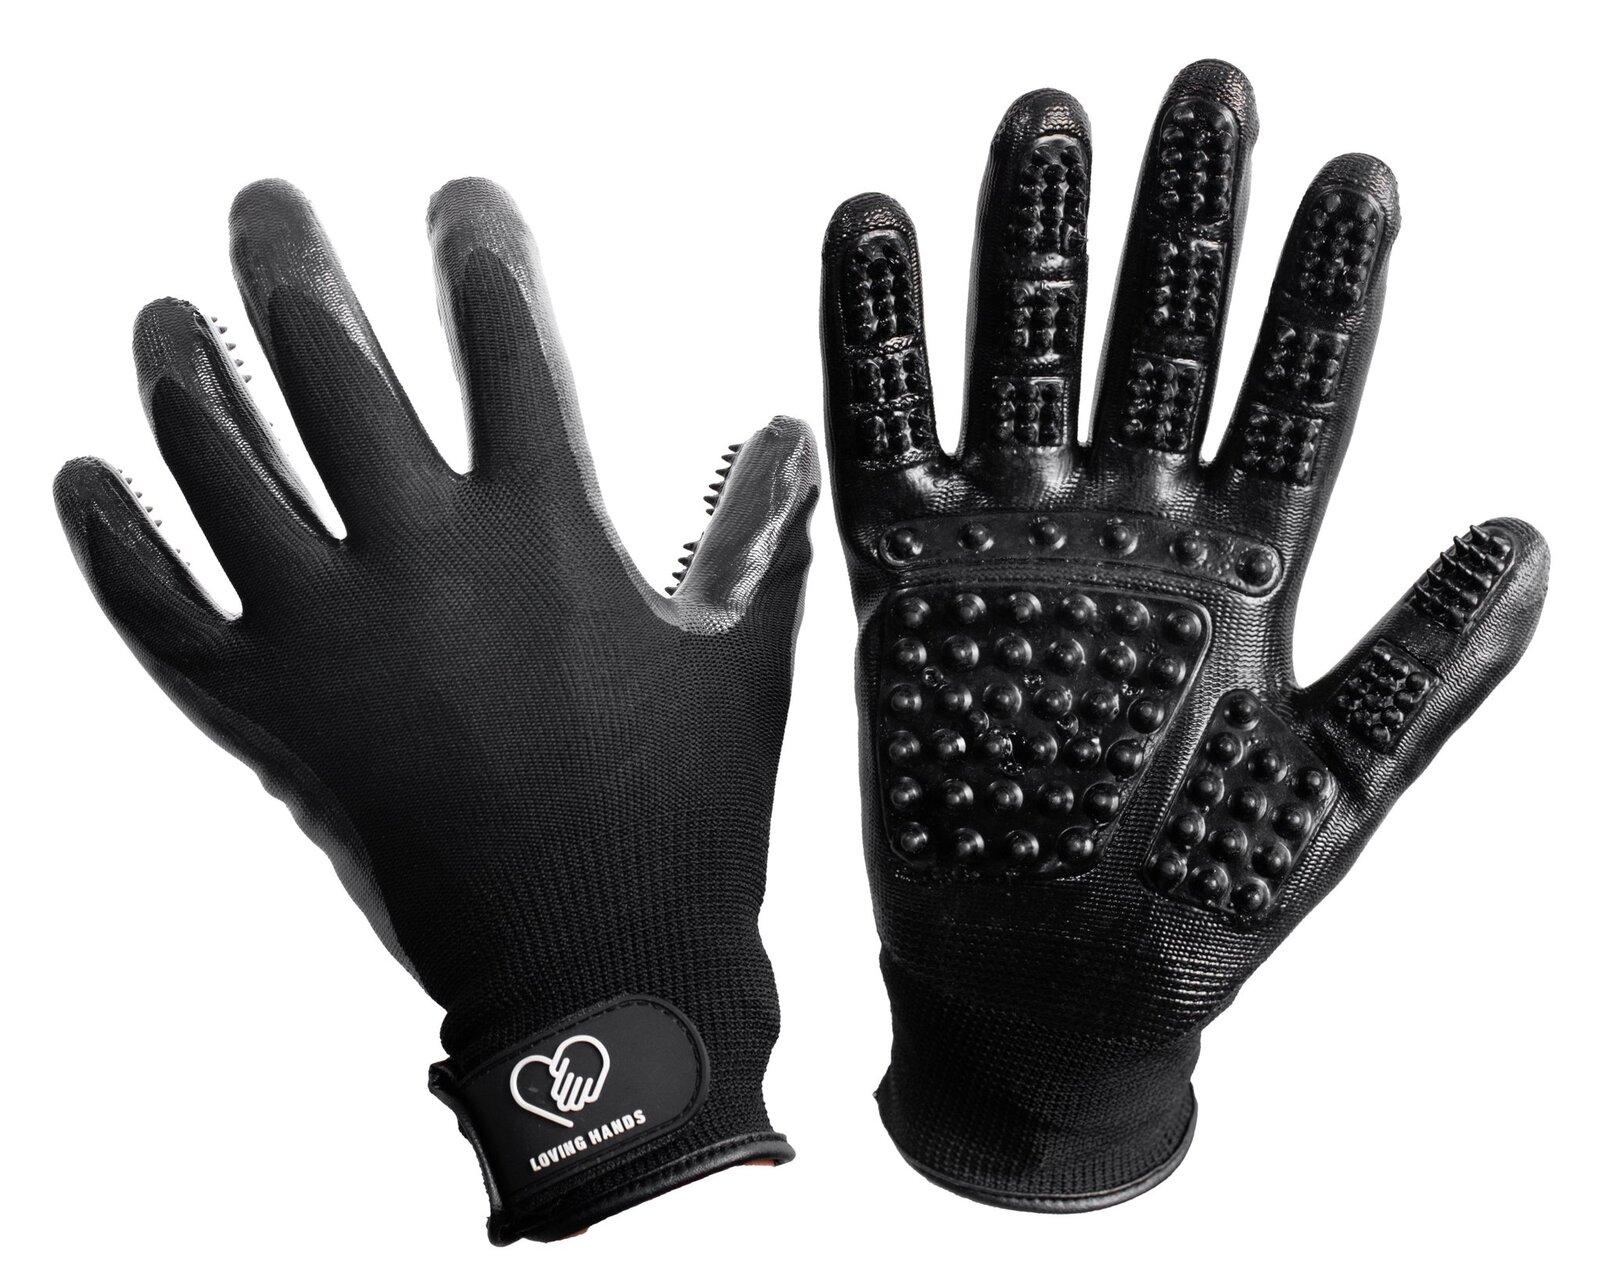 HandsOn Grooming Gloves Large at Bowral Coop